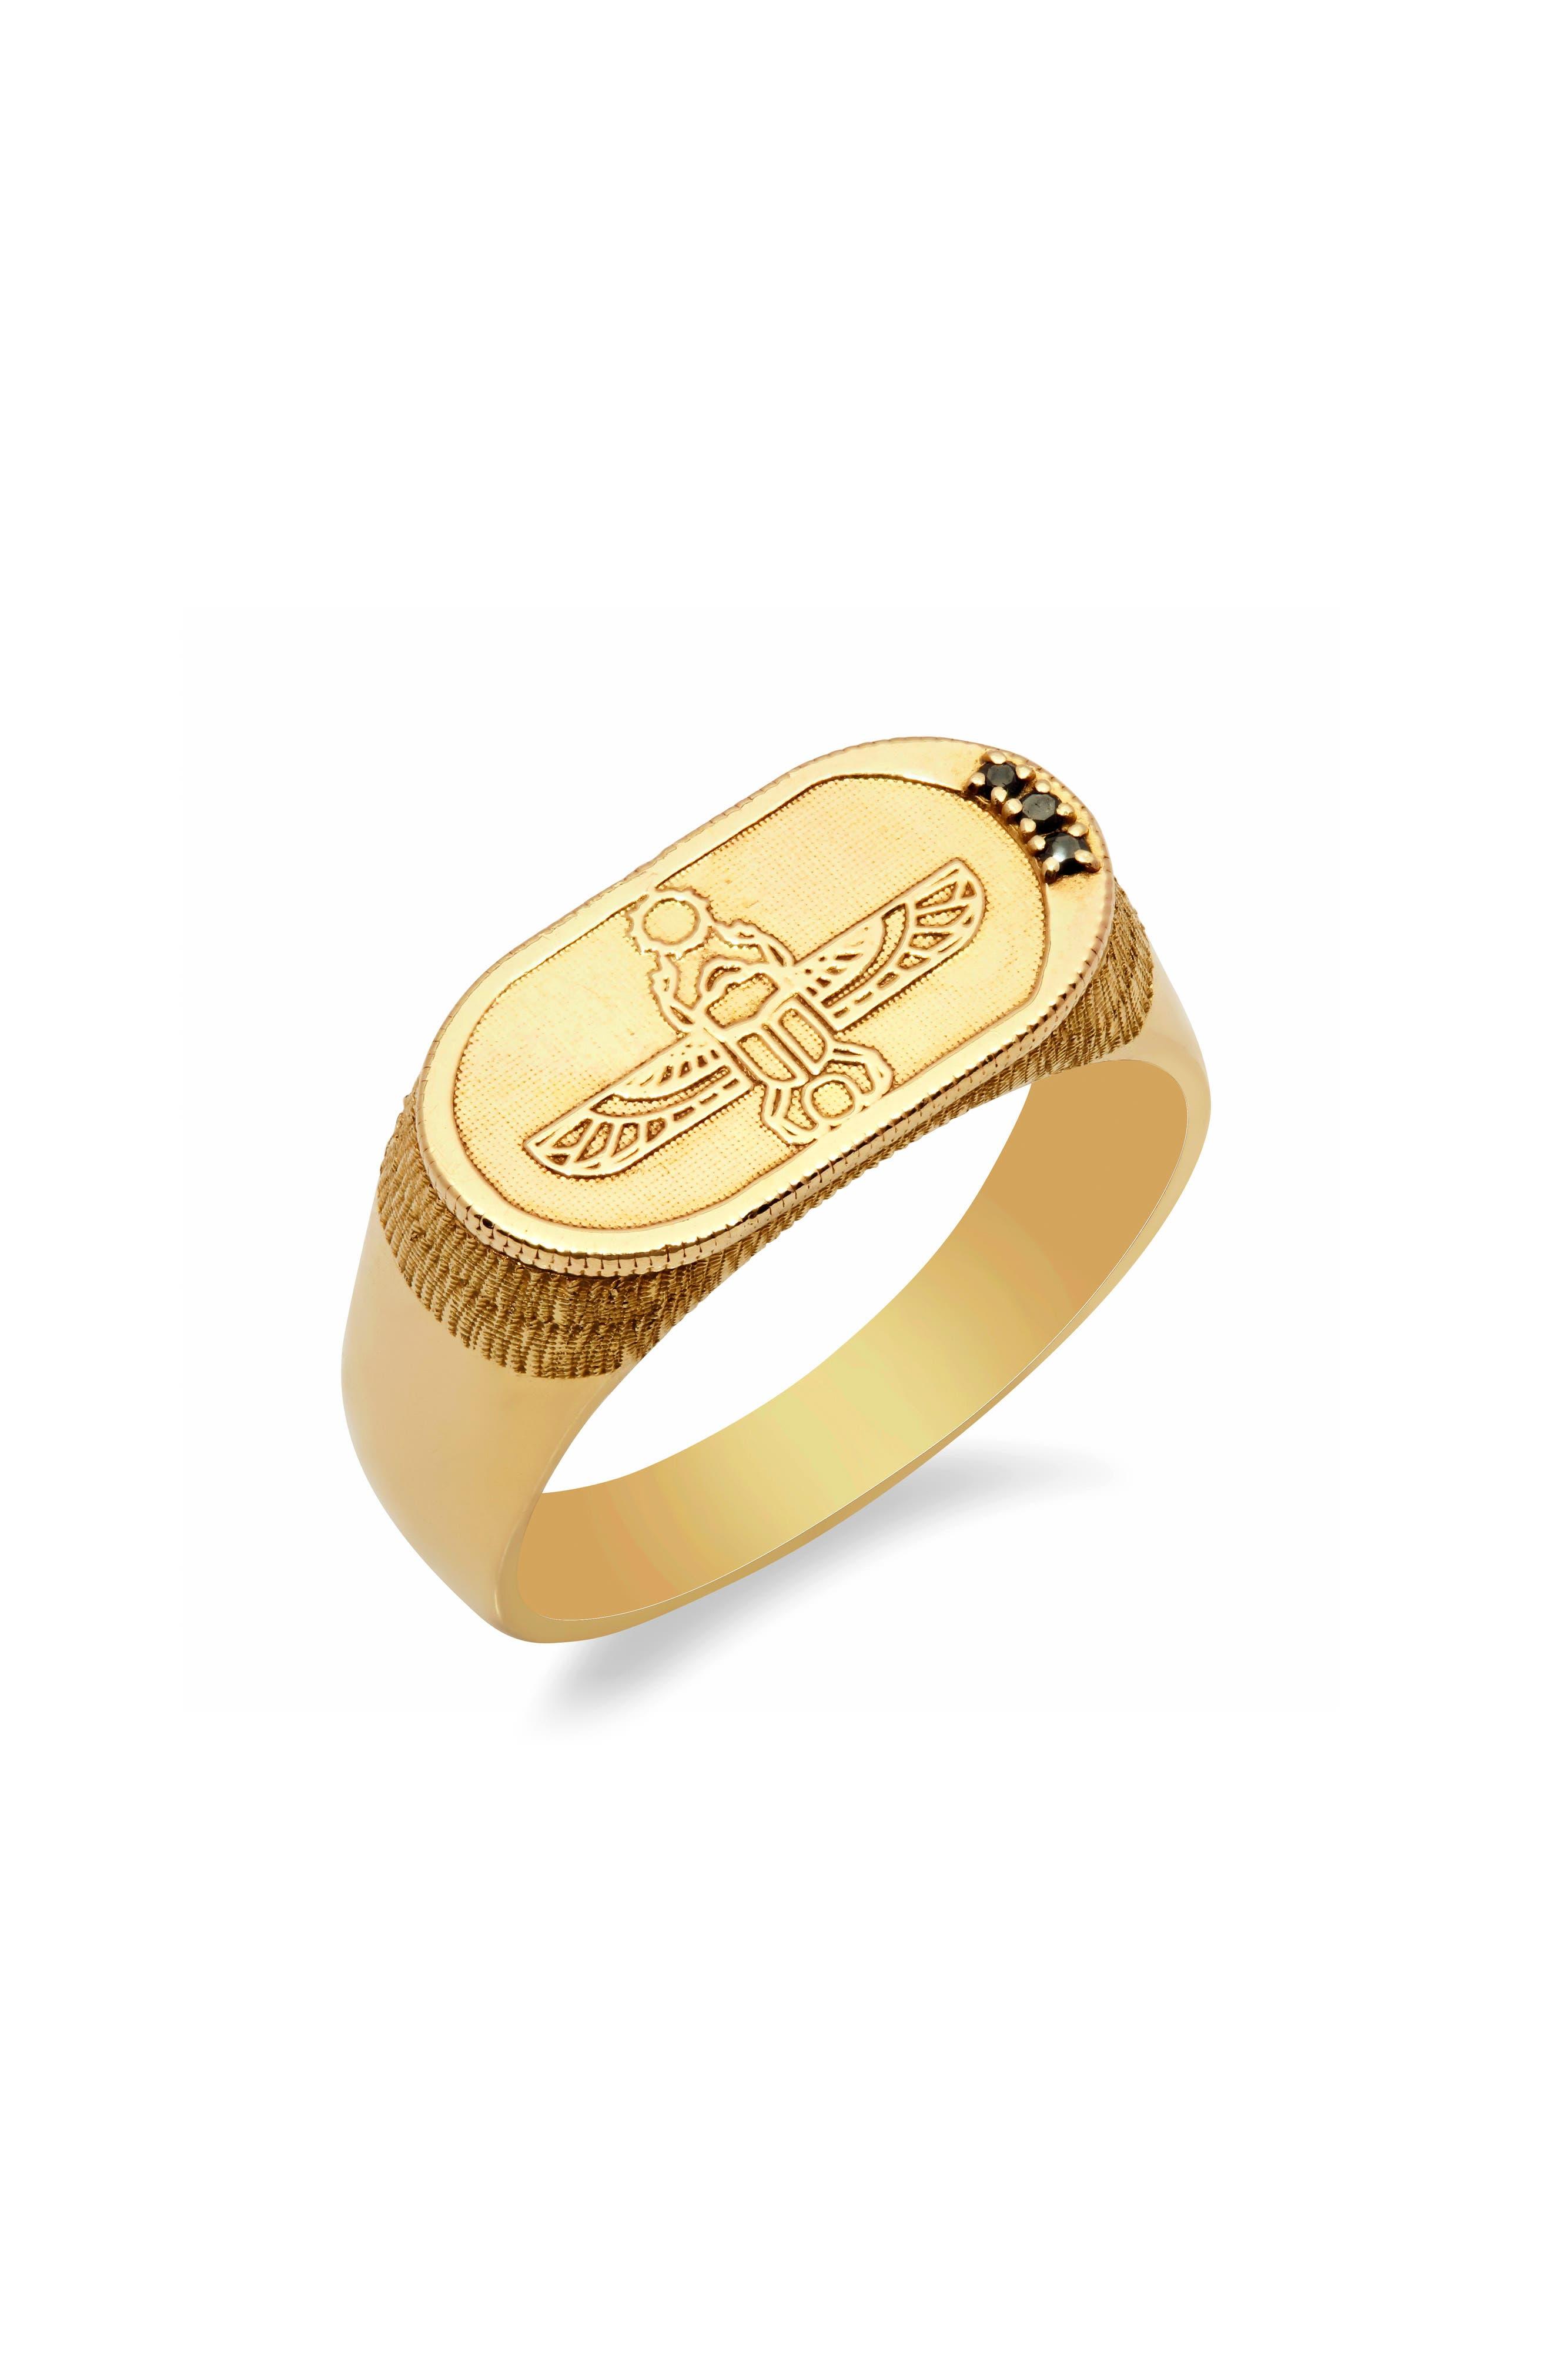 Congés Old School Black Diamond Scarab Ring,                             Main thumbnail 1, color,                             YELLOW GOLD